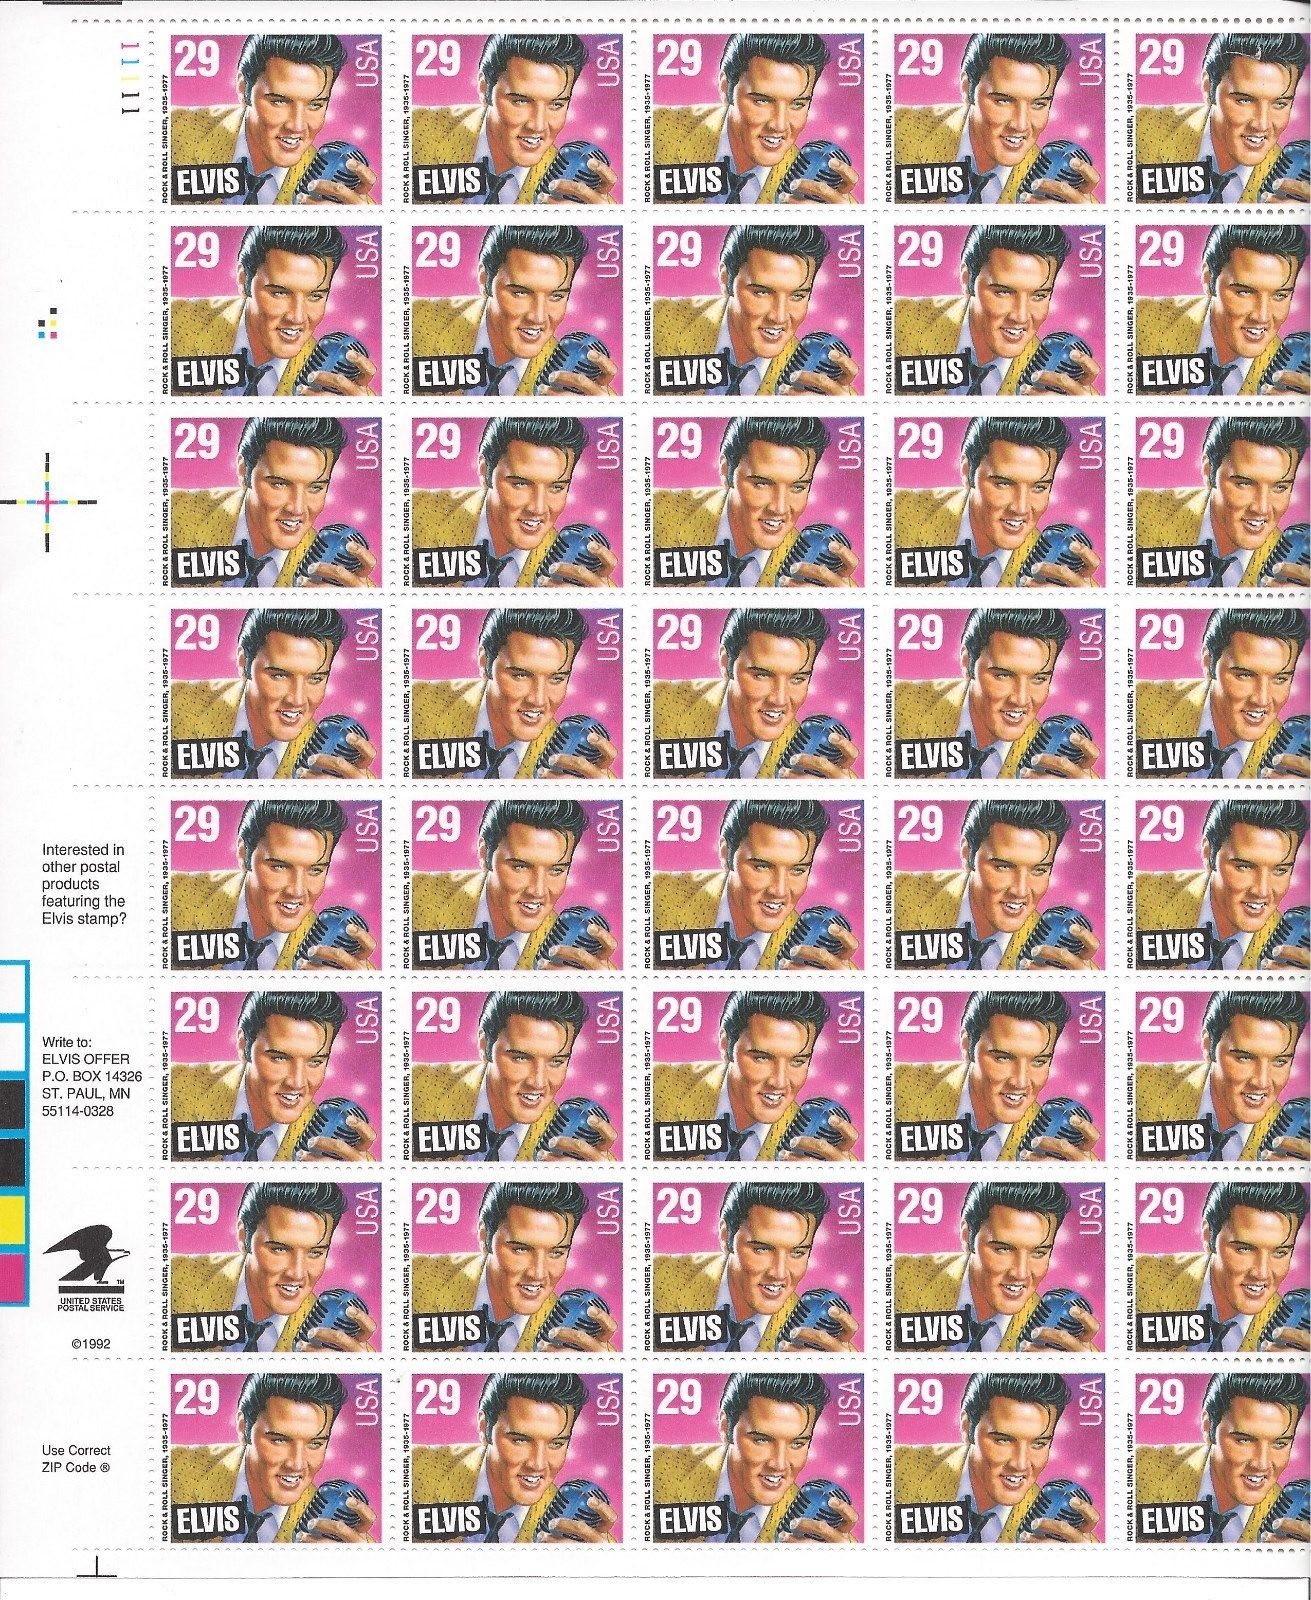 2721 Full Sheet 29 Cent Elvis Presley Rock And Roll Star King HipStamp